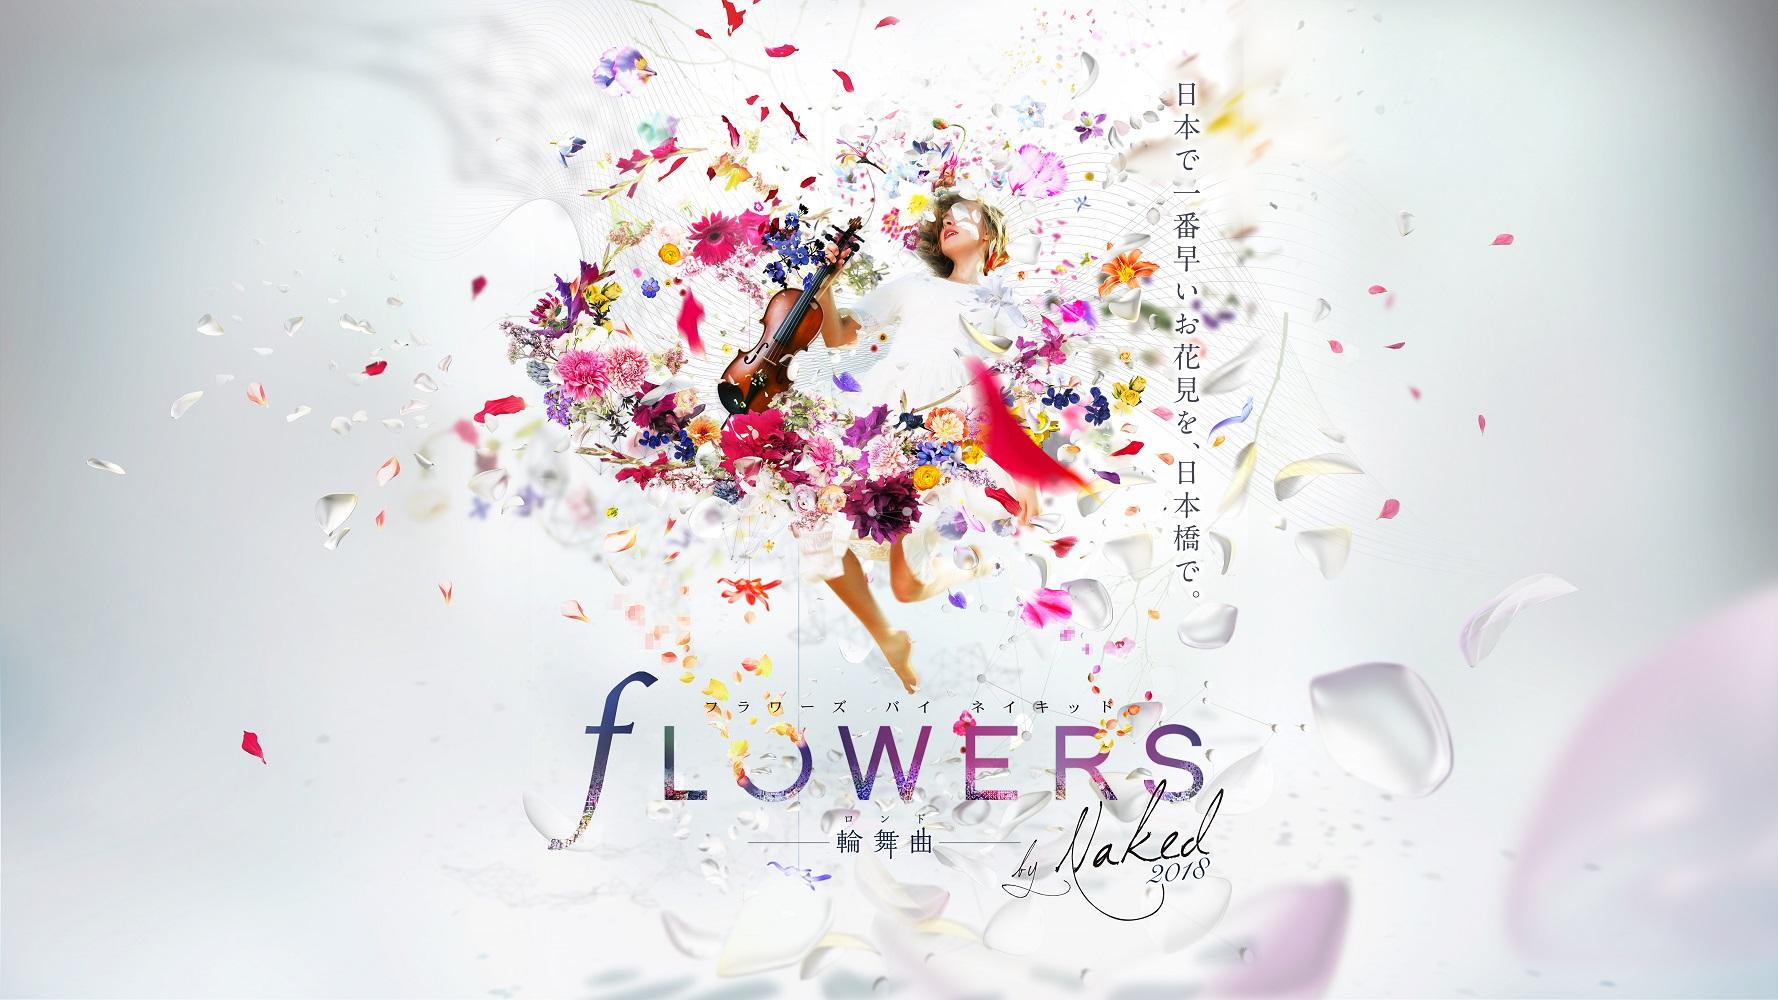 Flowers2018-nihonbashi_MV_yoko_1117-2_fin_S